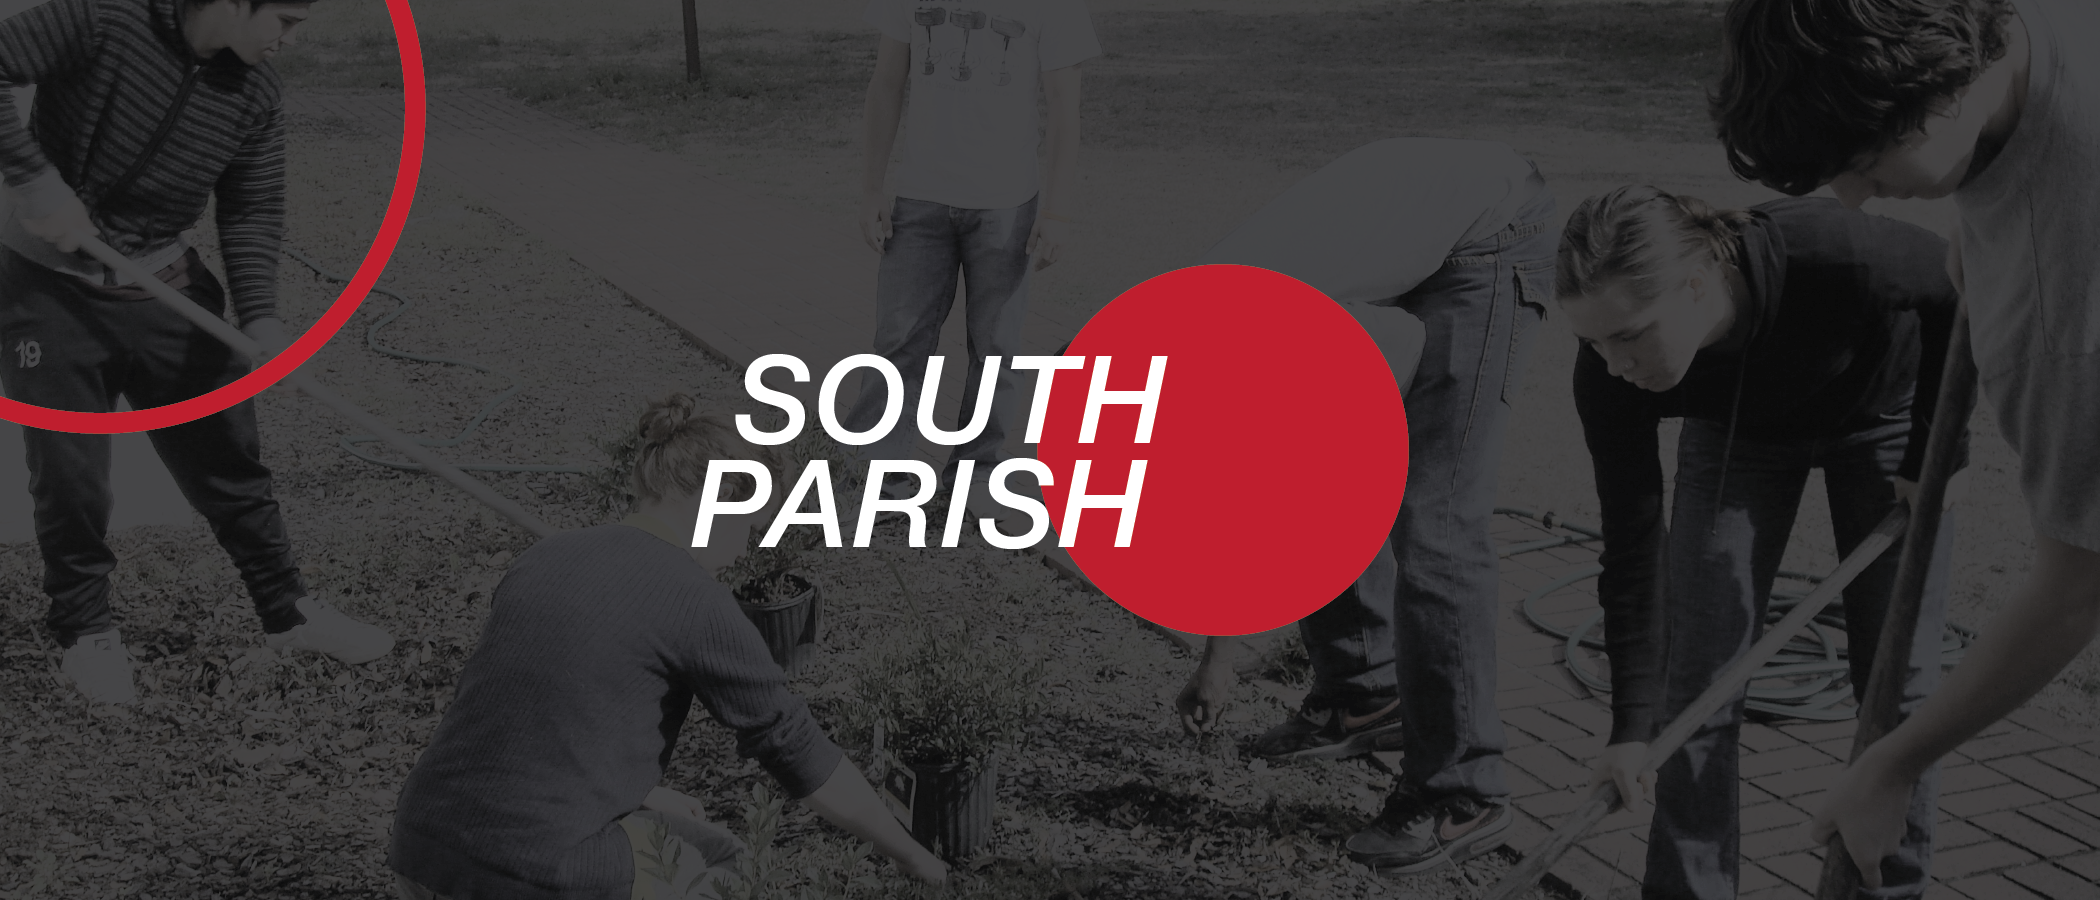 southparish-01.png